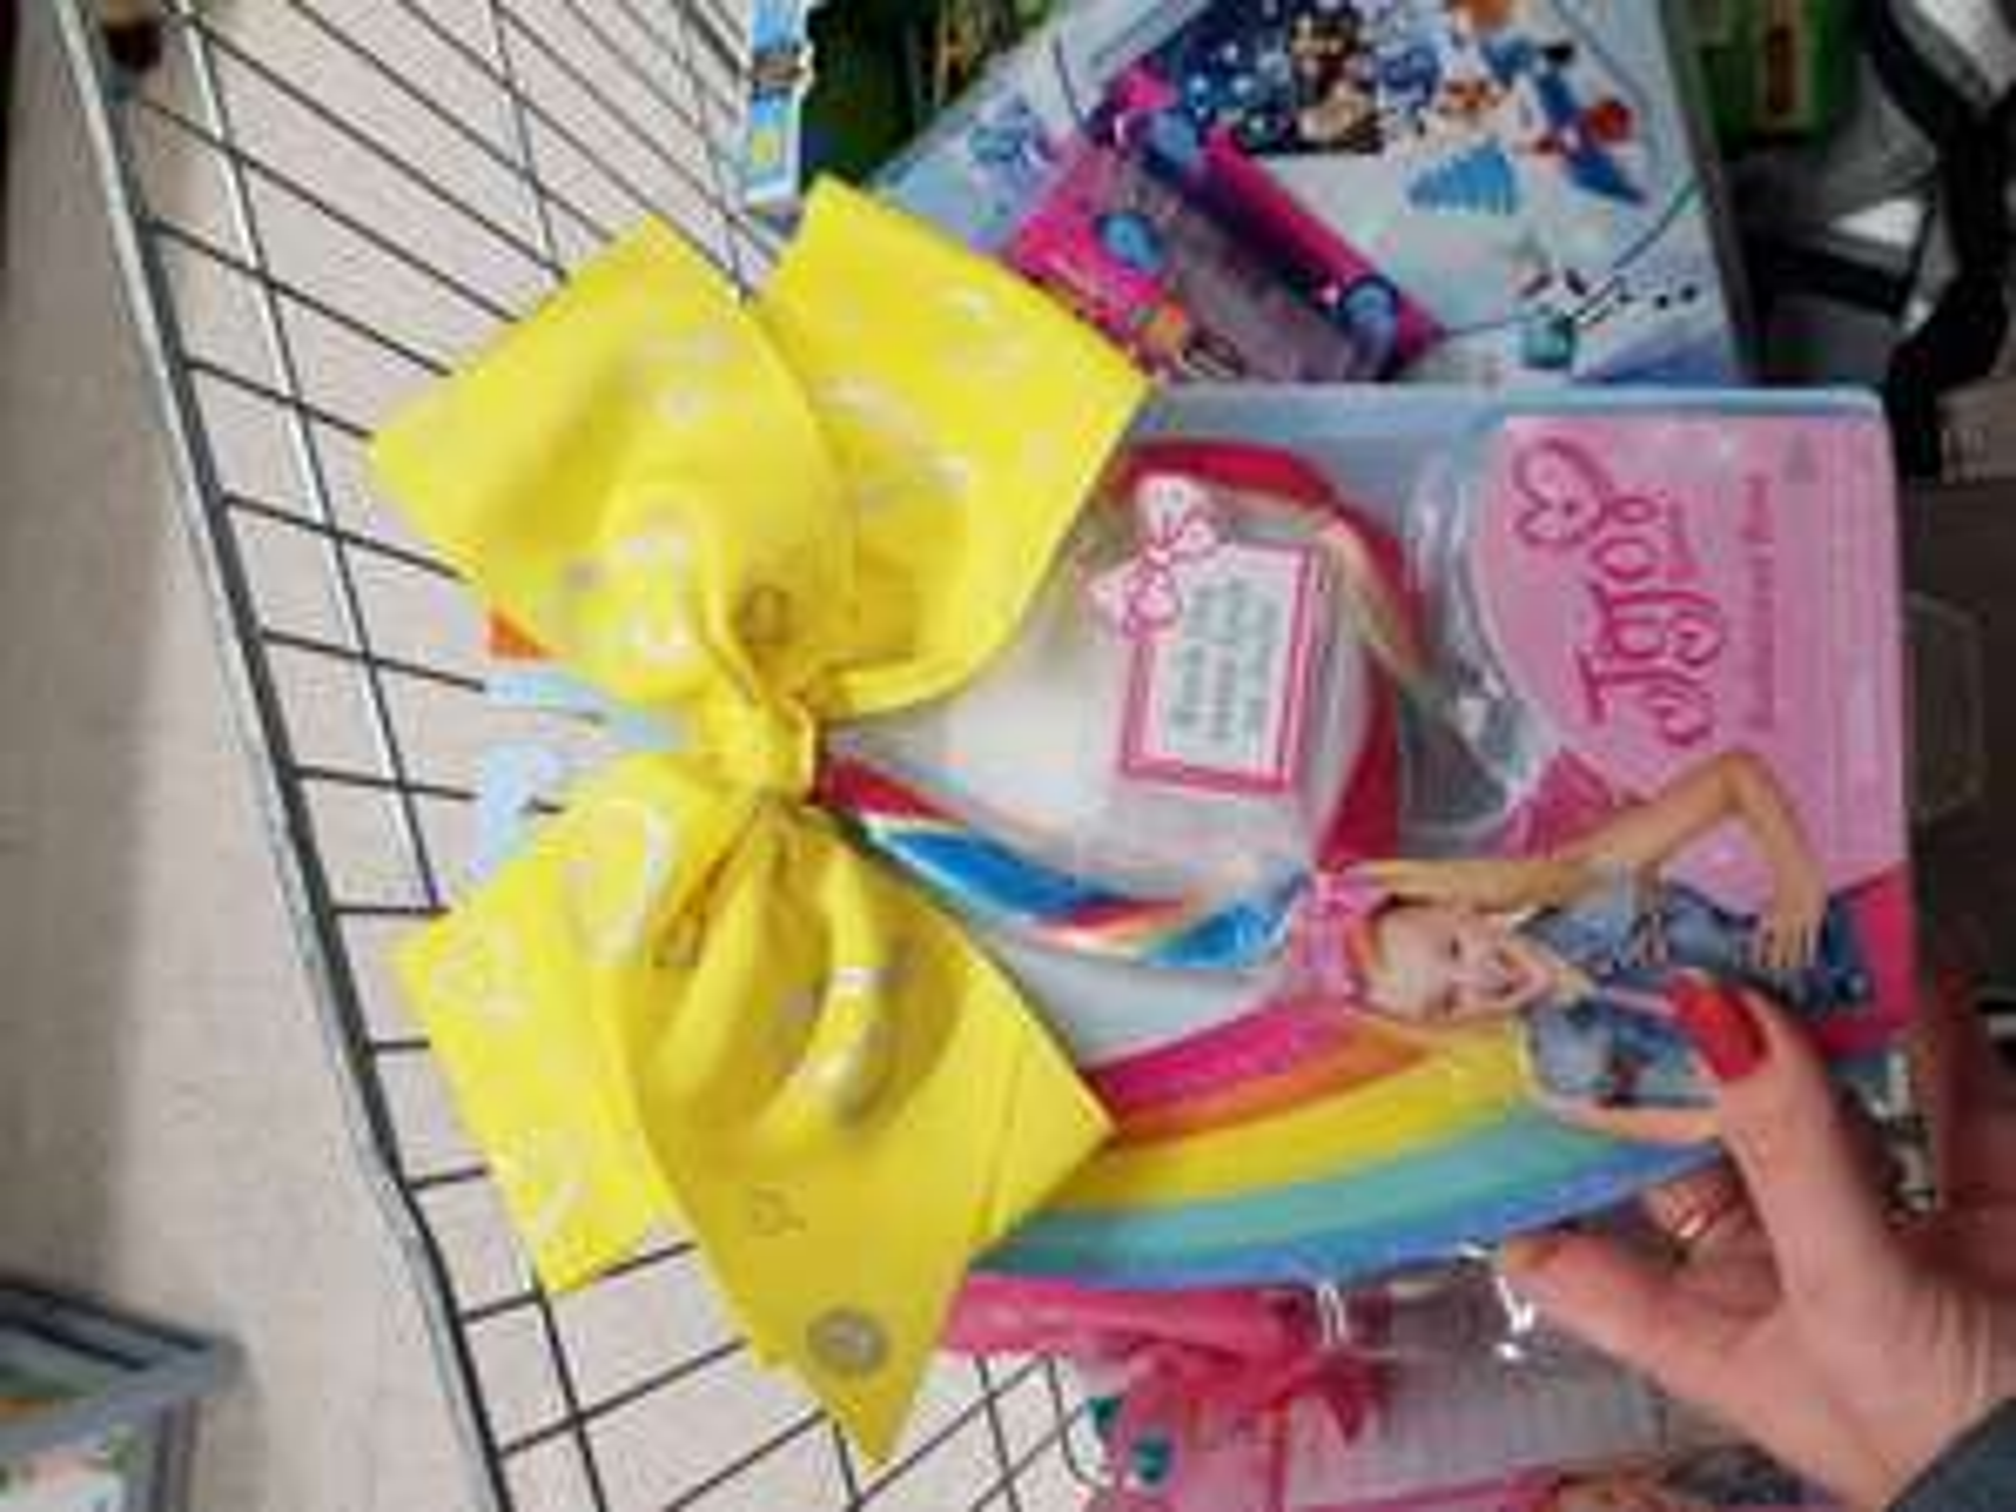 JOJO bodacious bow ASDA £2 instore